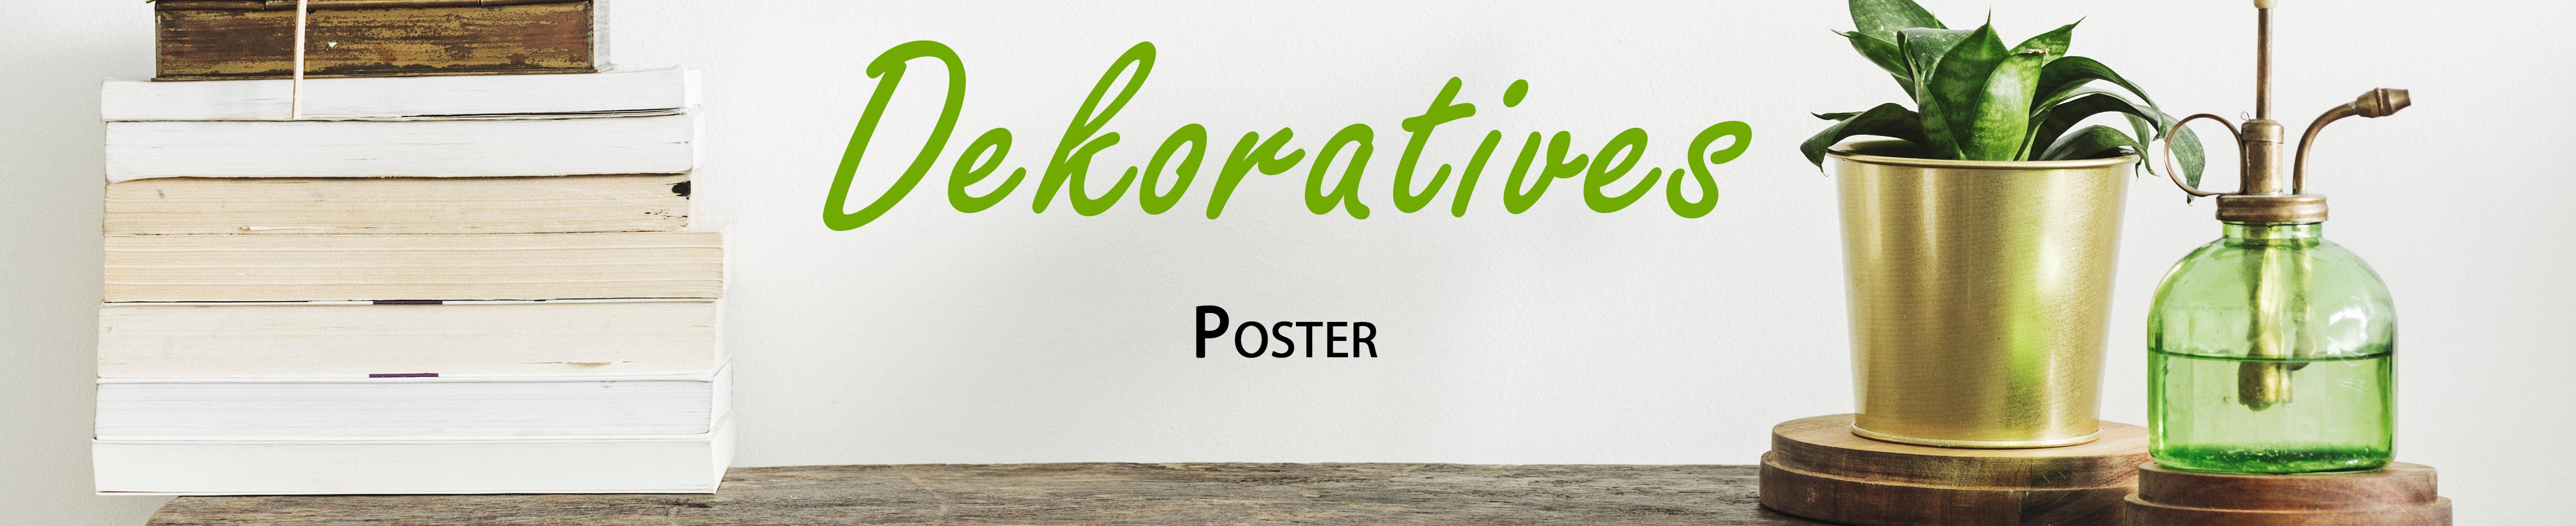 Kategorie: Poster